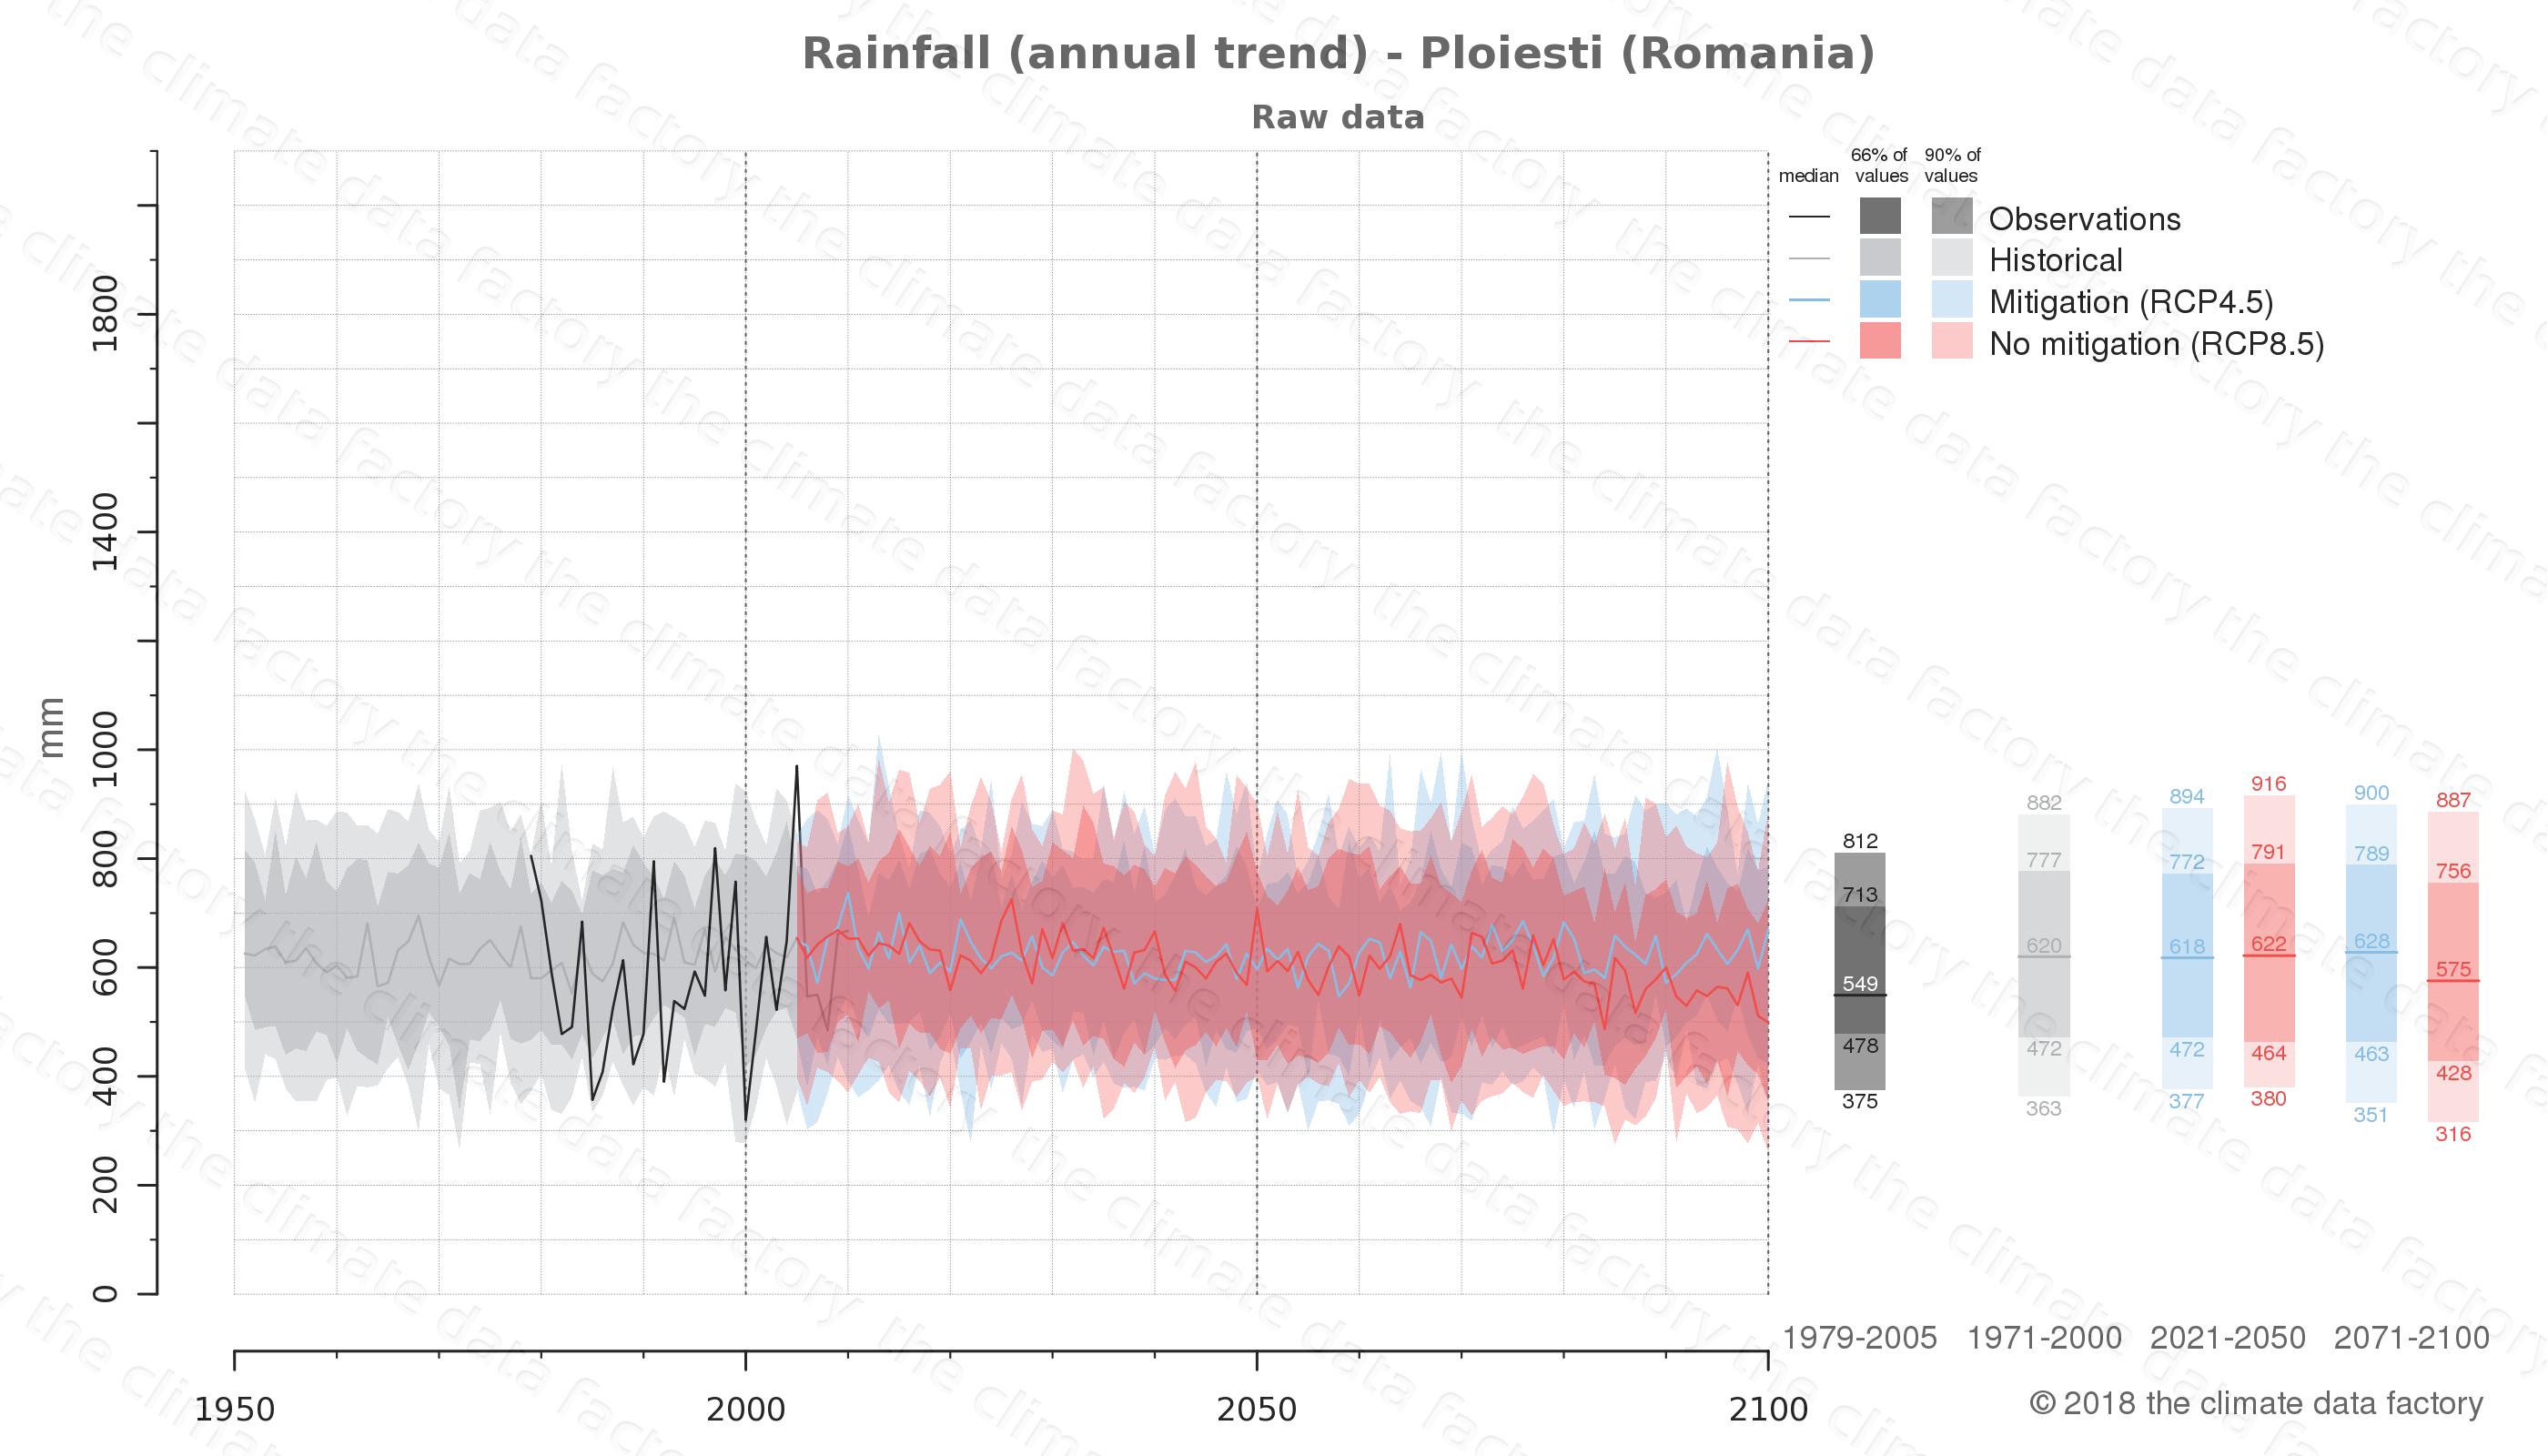 climate change data policy adaptation climate graph city data rainfall ploiesti romania